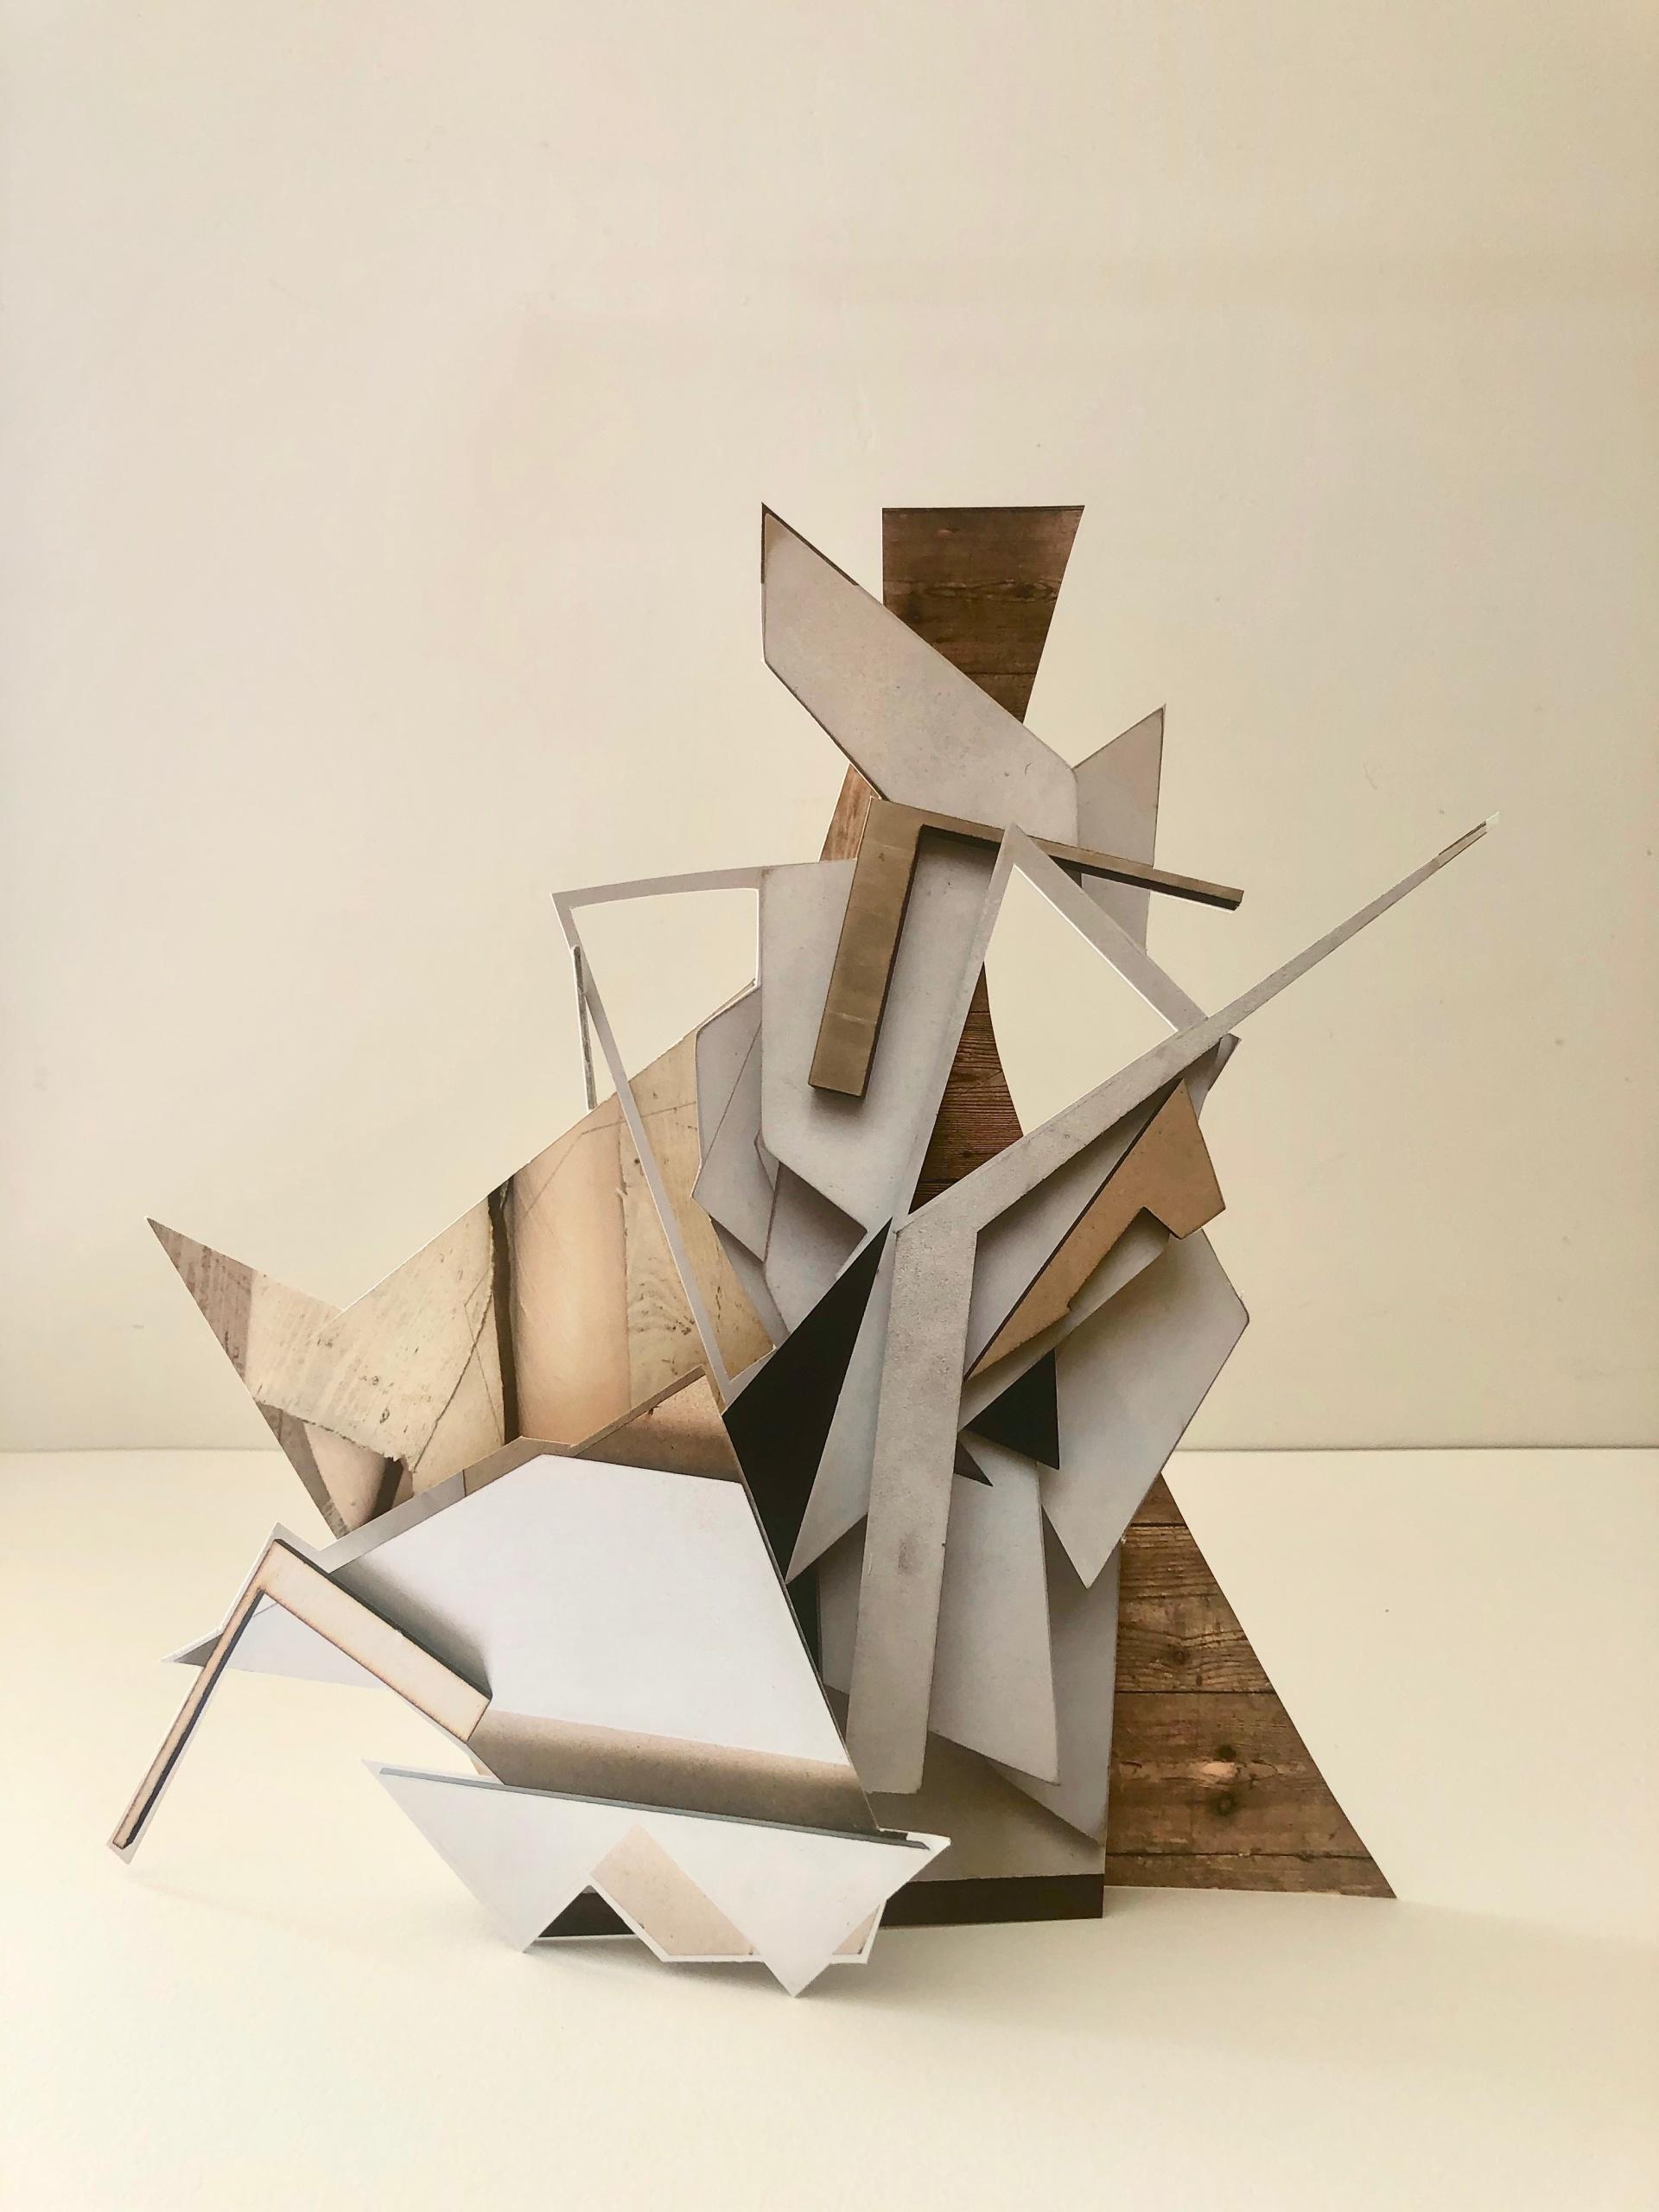 Andrea V Wright. Maquette for future sculpture 9  Digital Print, Card 26 x 35 x 9 cm. 2020